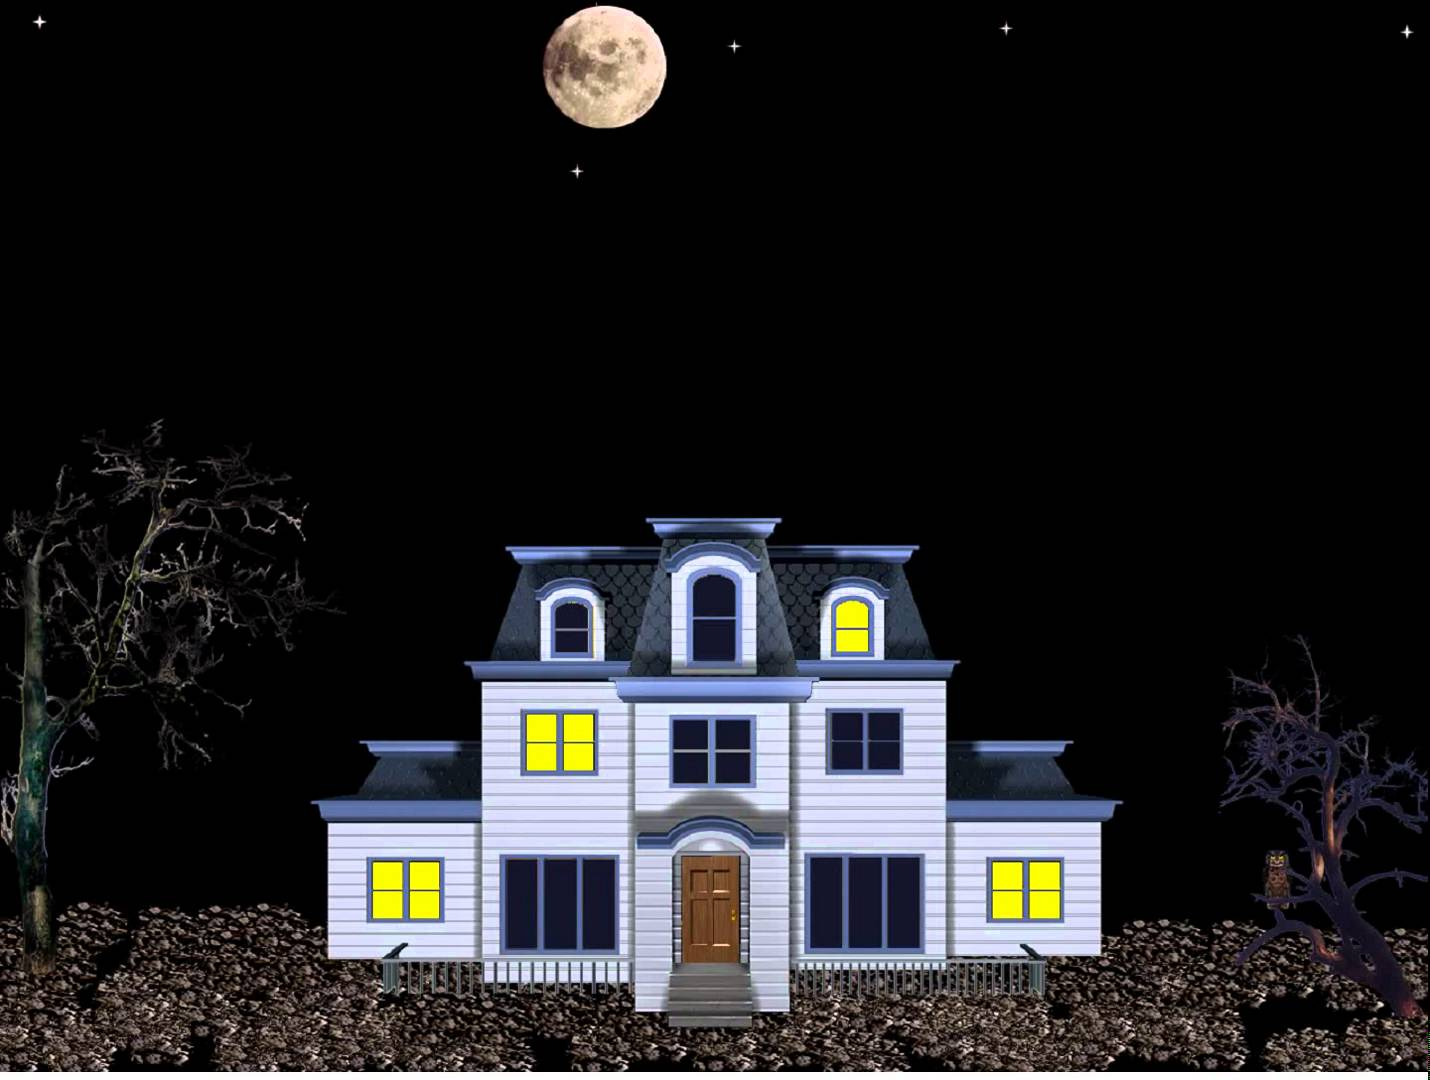 Haunted House Wallpaper and Screensavers Haunted Mansion Screensaver 1430x1080